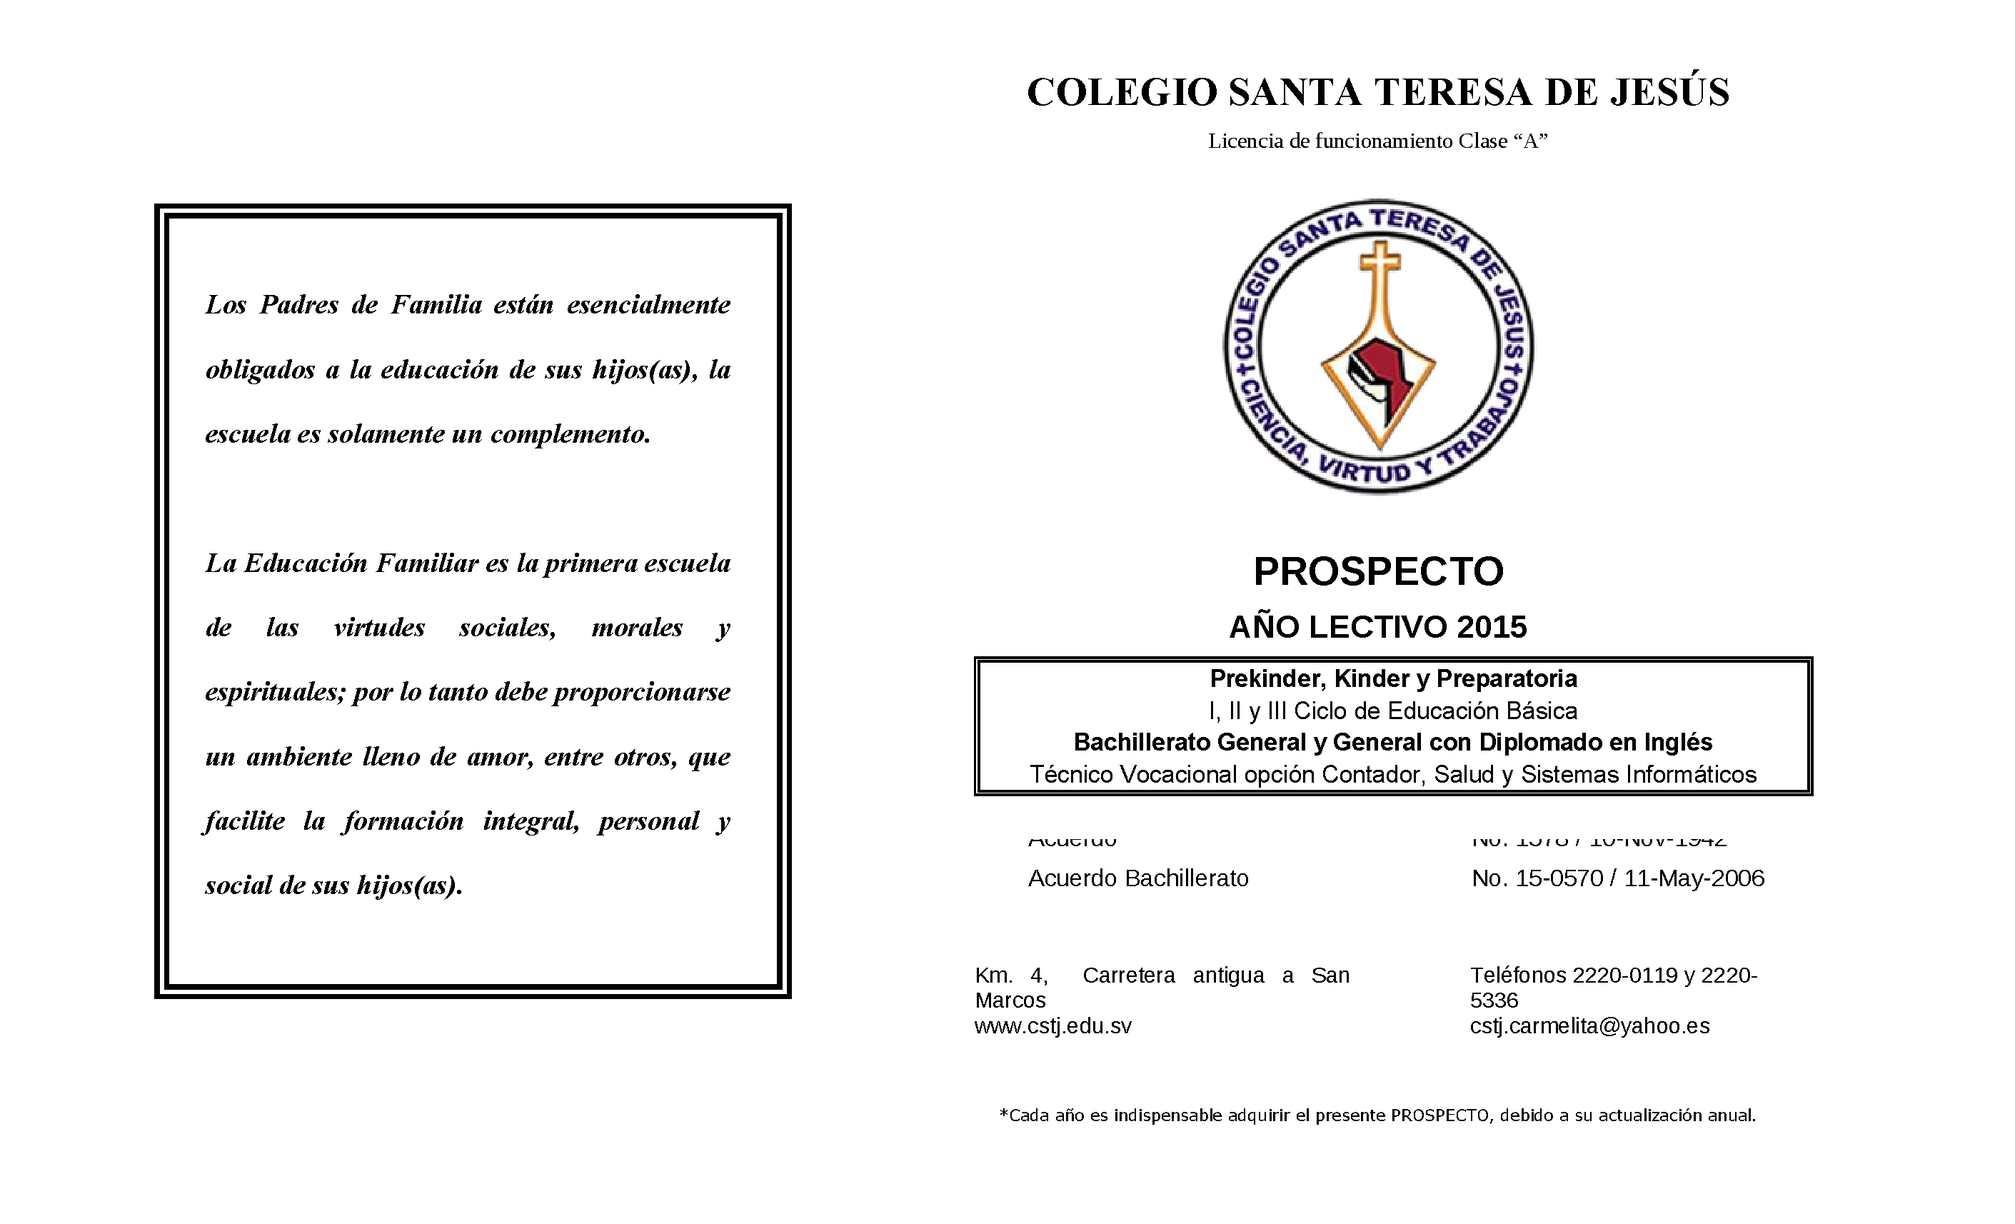 Calaméo - Prospecto cstj 2015